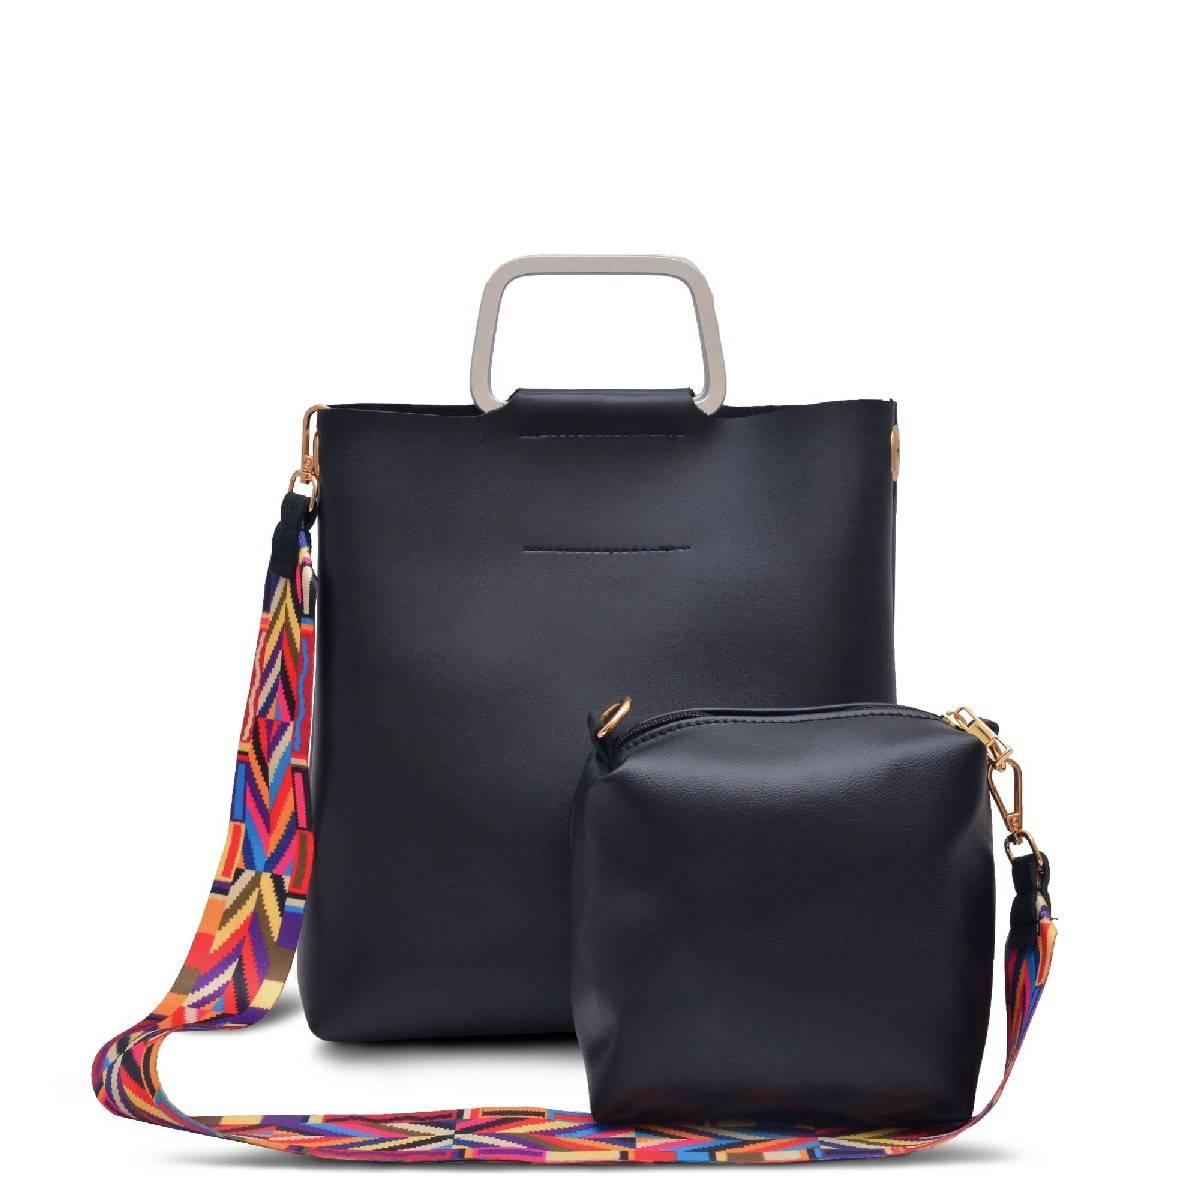 Astore Silver Aluminium Handle Colorful Fix Detachable Strap Faux Leather Two Pieces Black Handbag and Shoulderbag